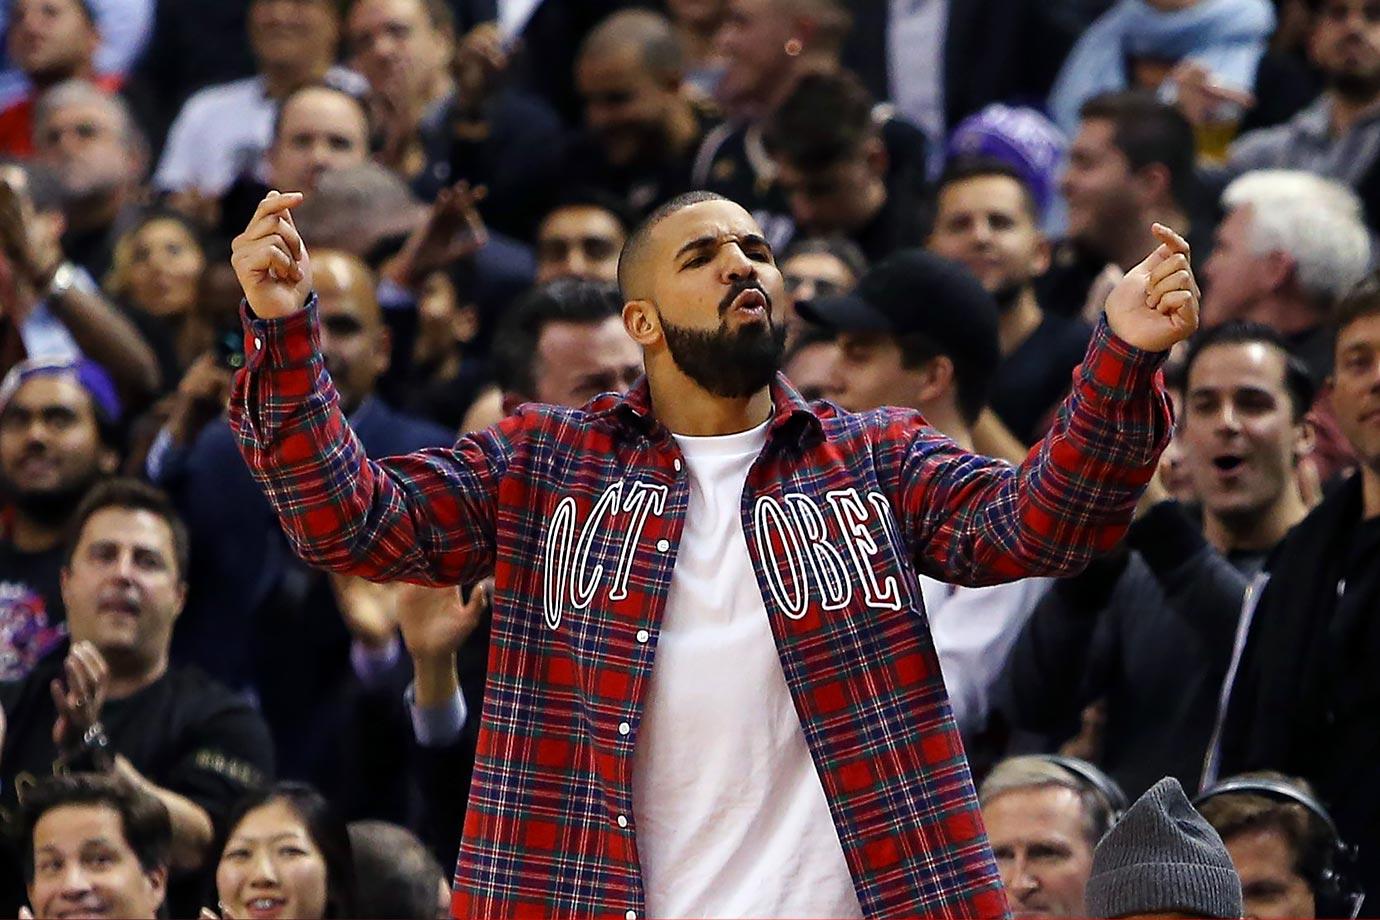 Toronto Raptors vs. Cleveland Cavaliers at Air Canada Centre in Toronto